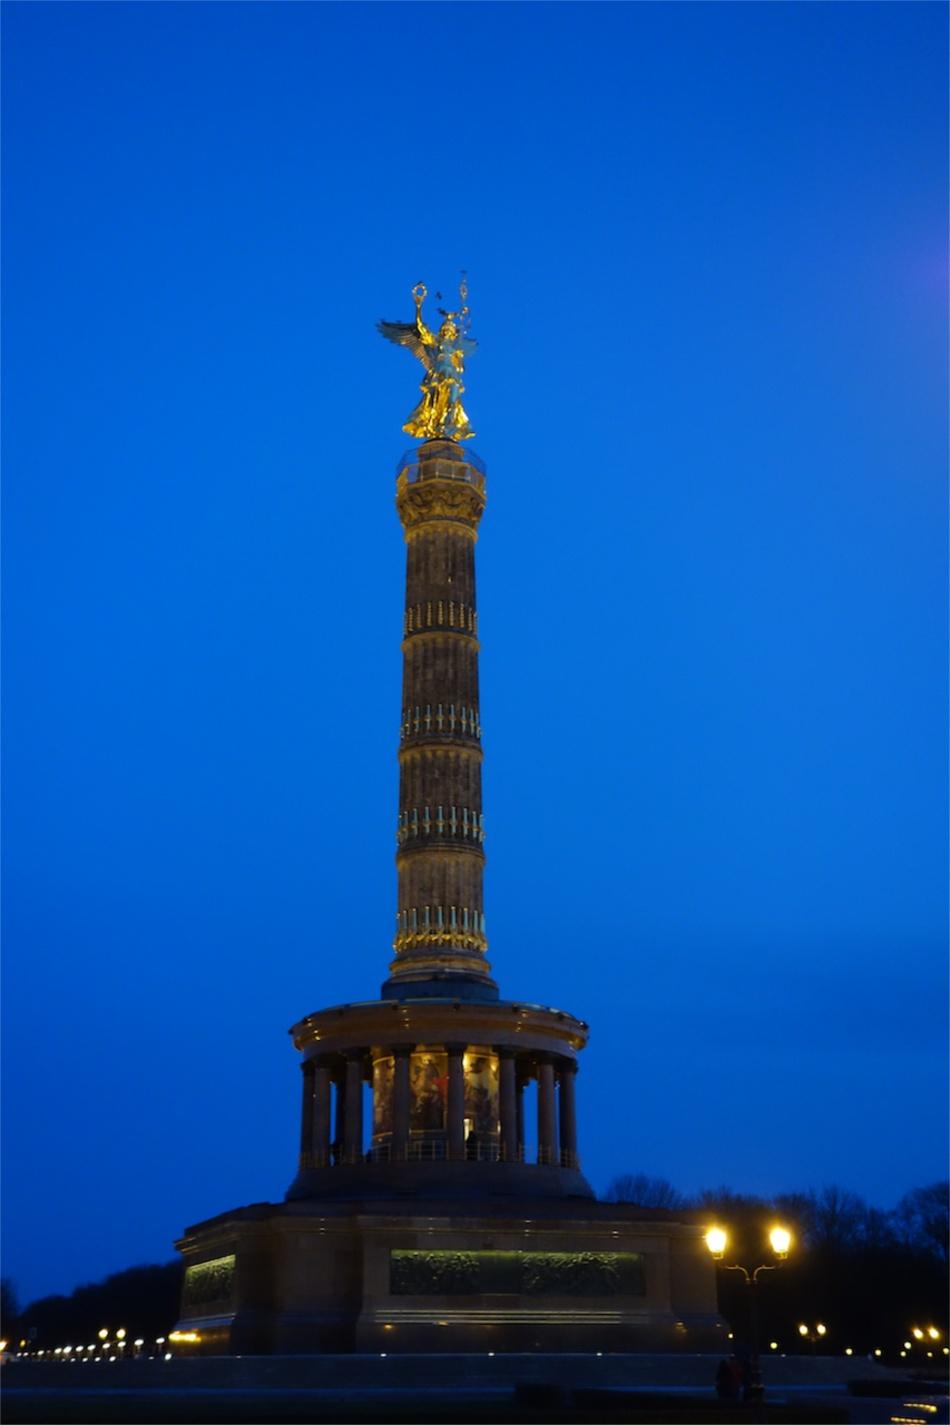 Victory Column at night - Berlin